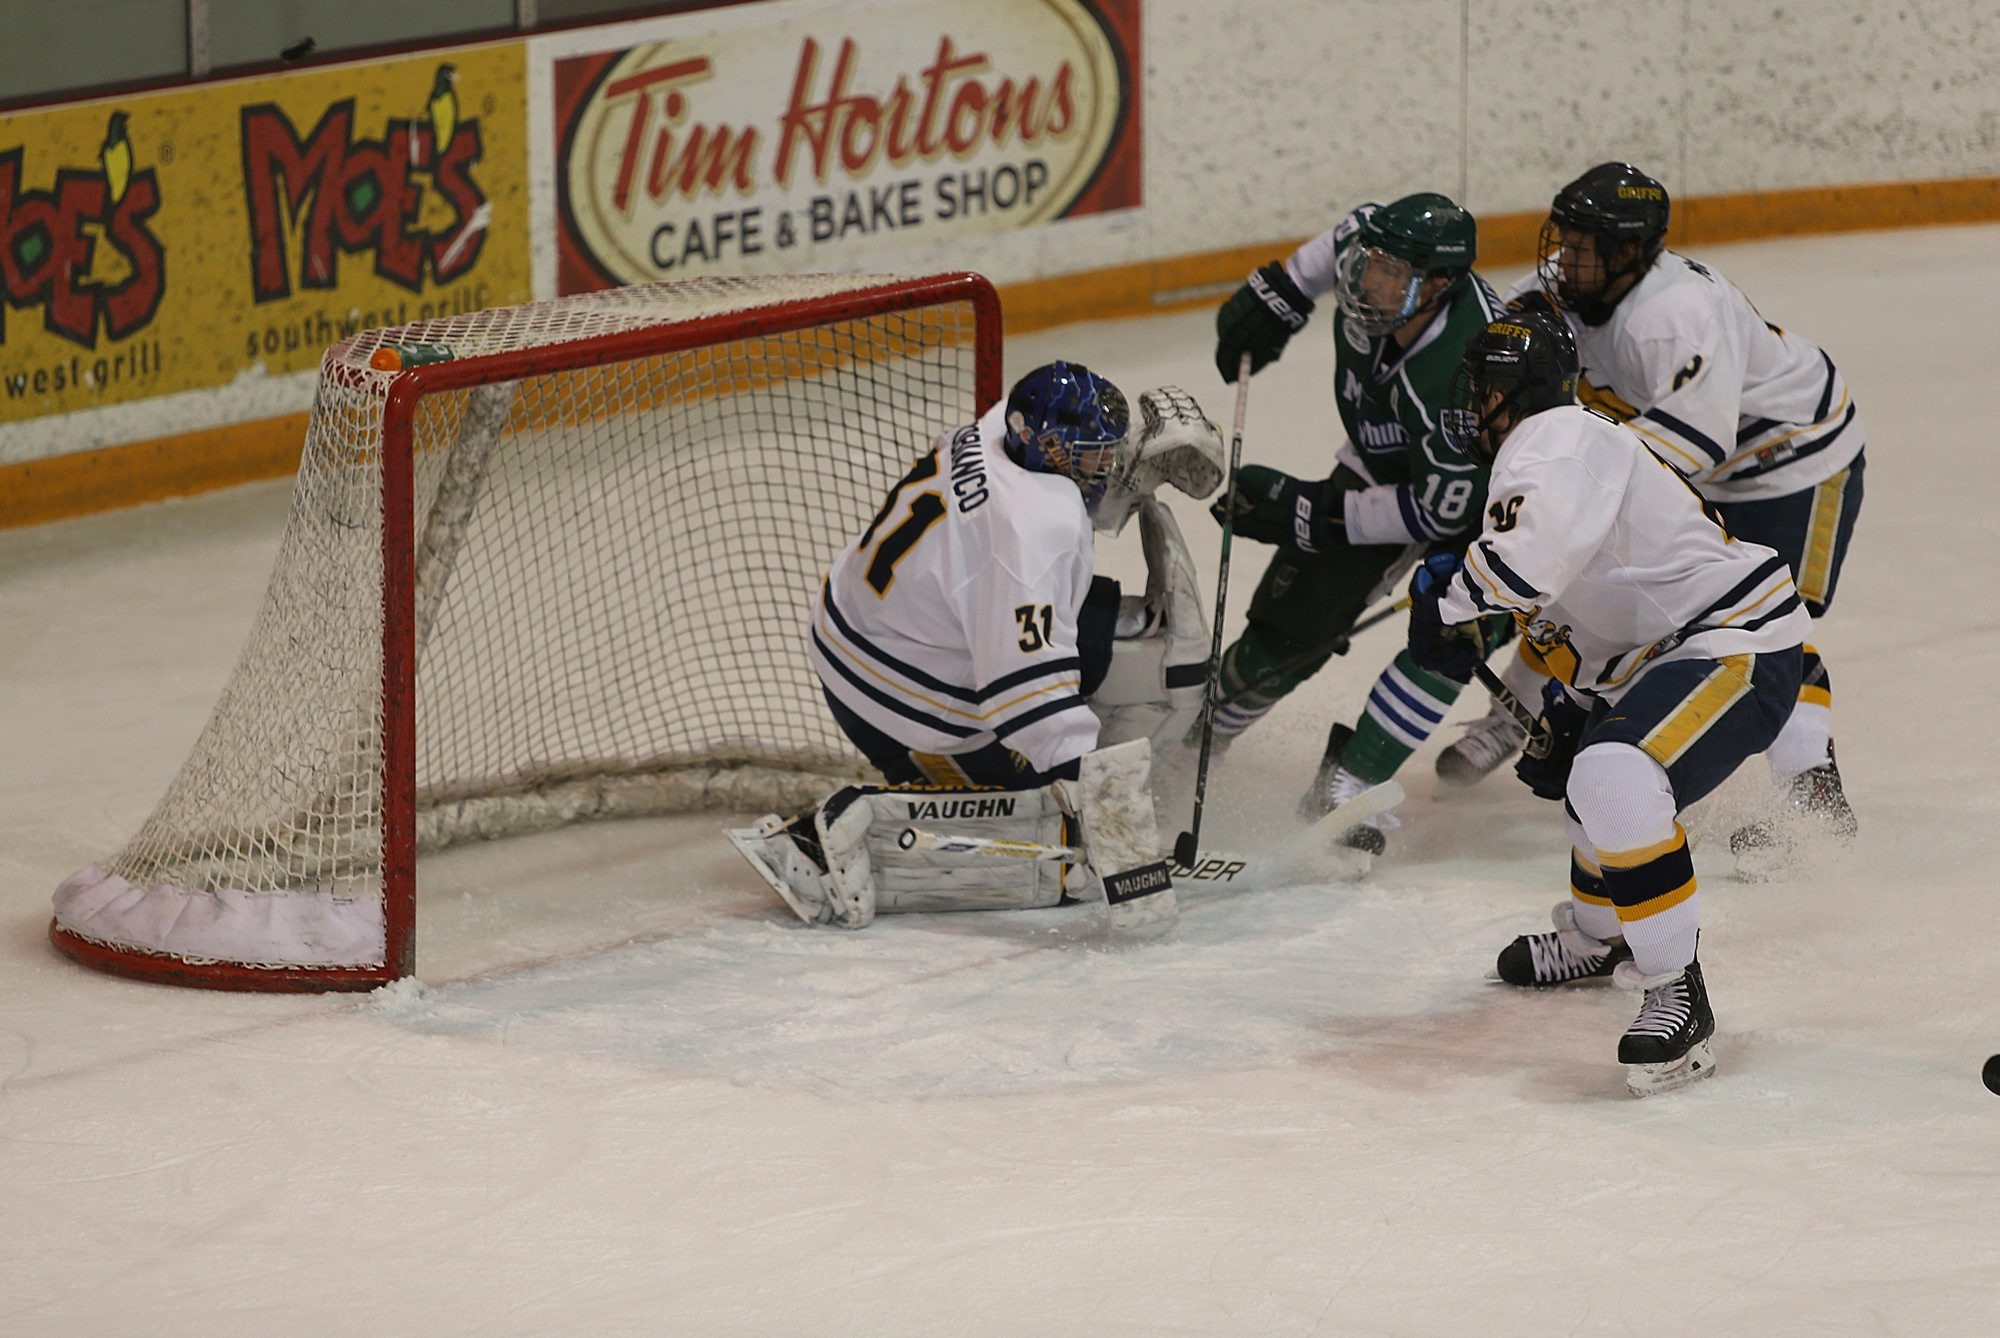 Canisius goaltender Tony Capobianco makes a save against Mercyhurst's Daniel O'Donoghue on Thursday.